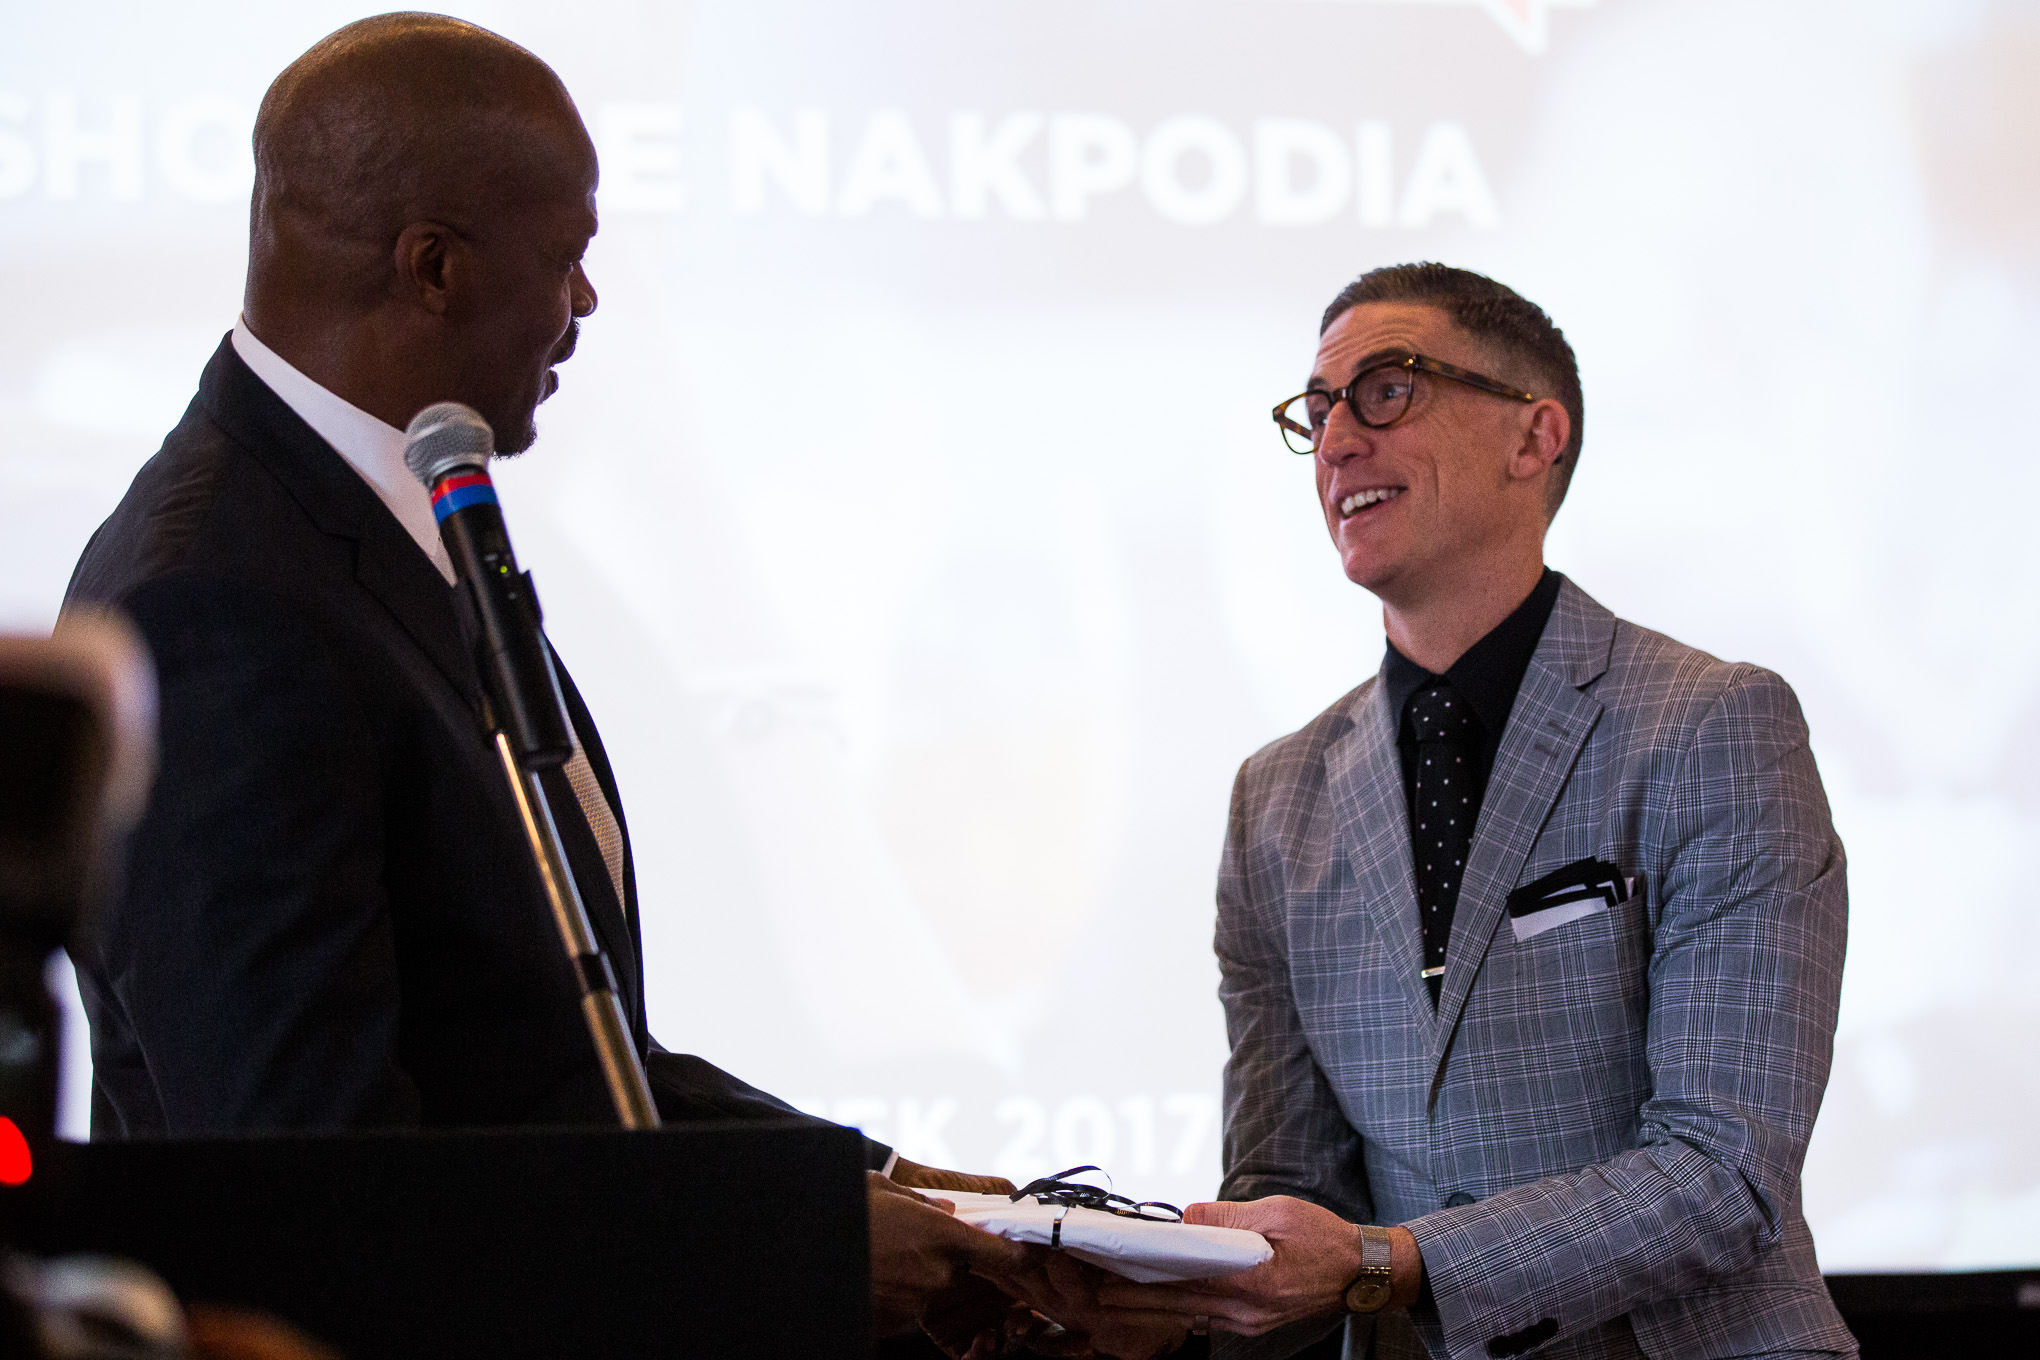 DreamVoice President Shokare Nakpodia gifts keynote speaker Pastor Ed Newton with the photo book 1005 Faces.